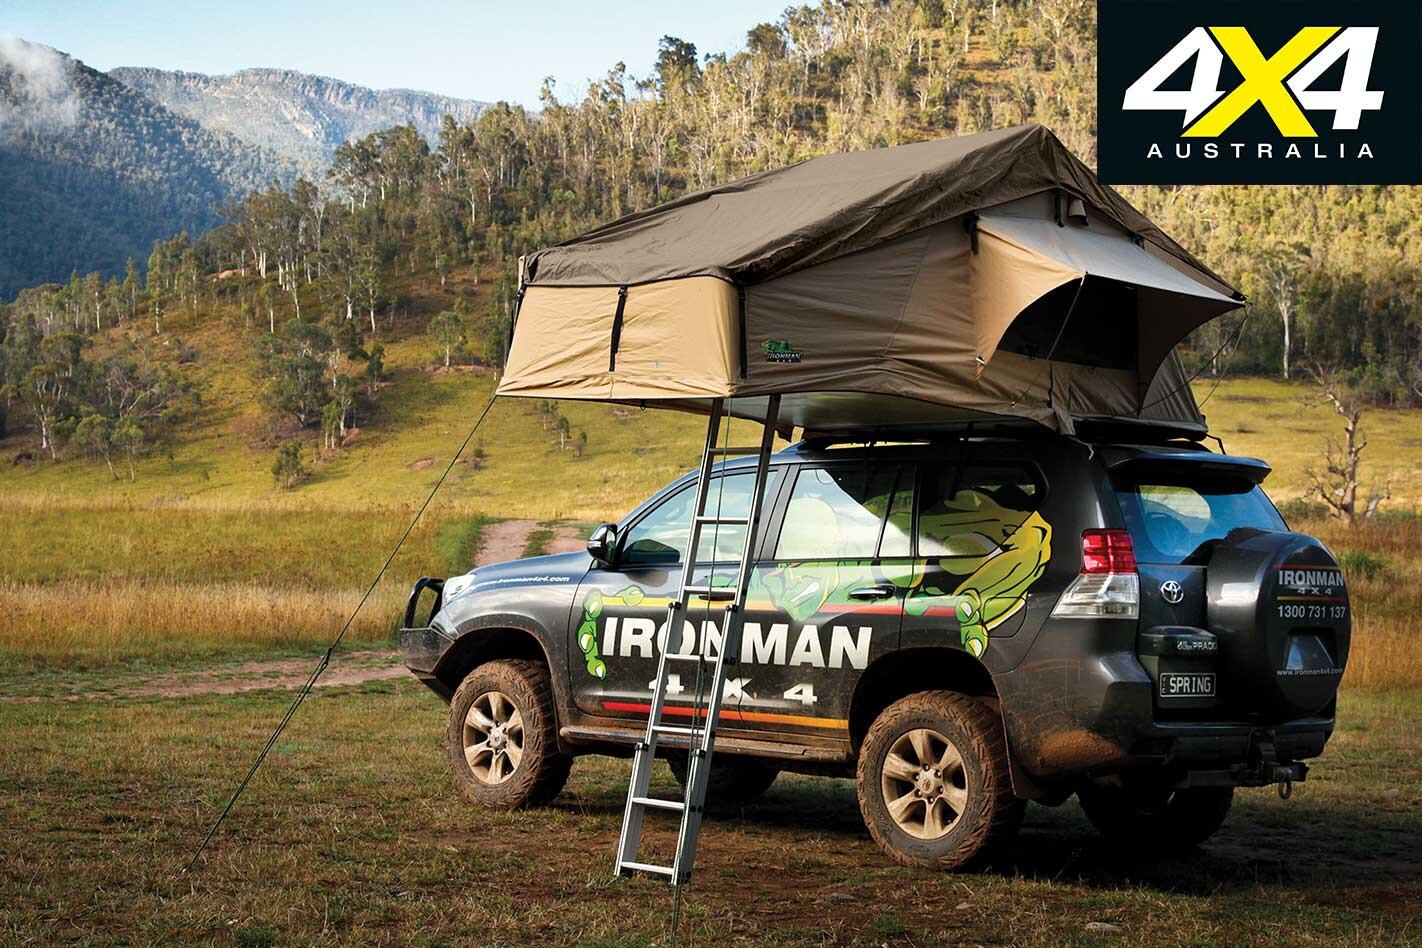 2019 4 X 4 Australia Gear Guide Camping Jpg